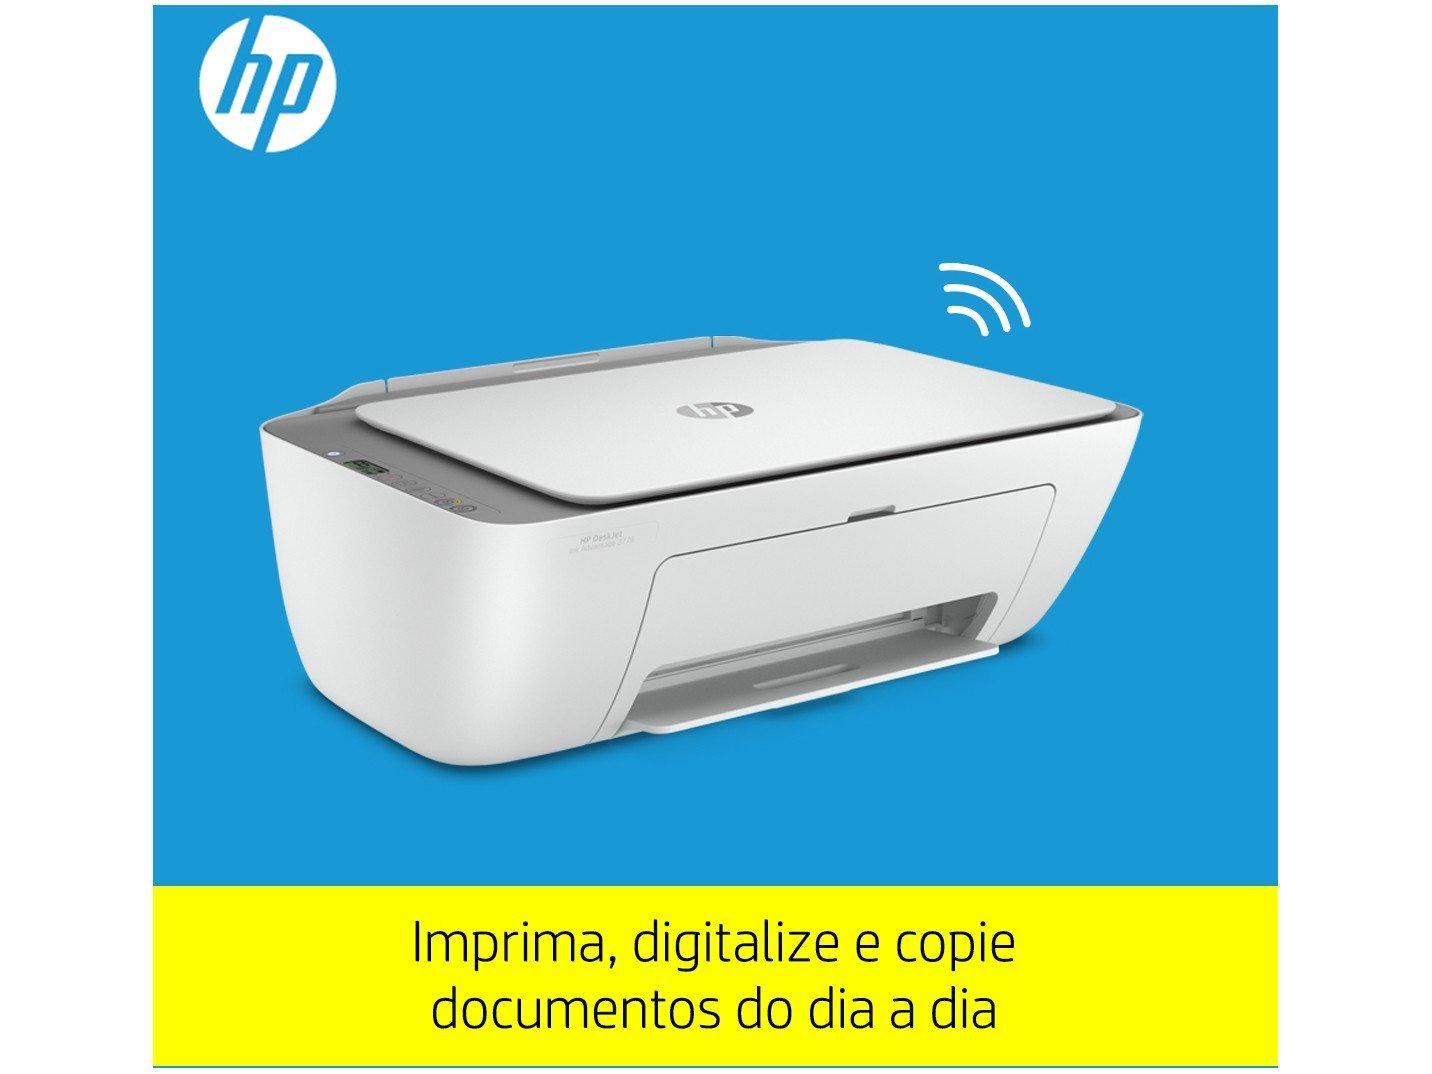 Impressora Multifuncional HP DeskJet Ink Advantage - 2776 Jato de Tinta Colorida Wi-Fi USB - Bivolt - 3